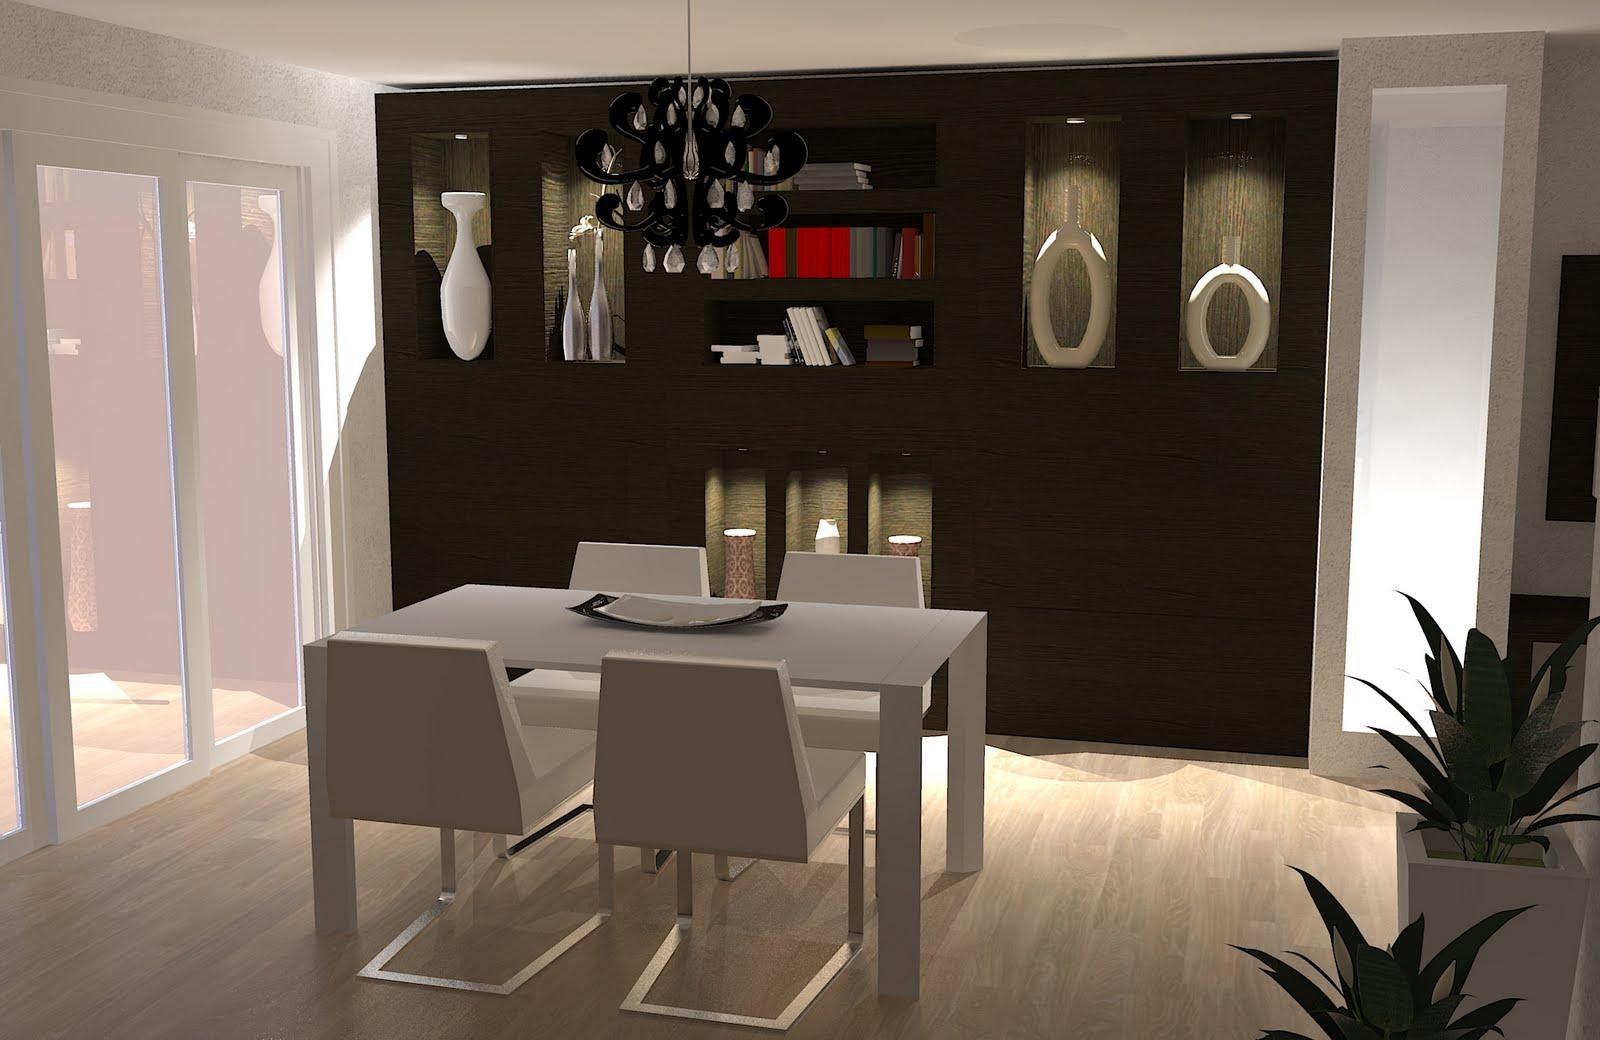 Arredamenti diotti a f blog arredamento part 9 for Easy dining room decorating ideas